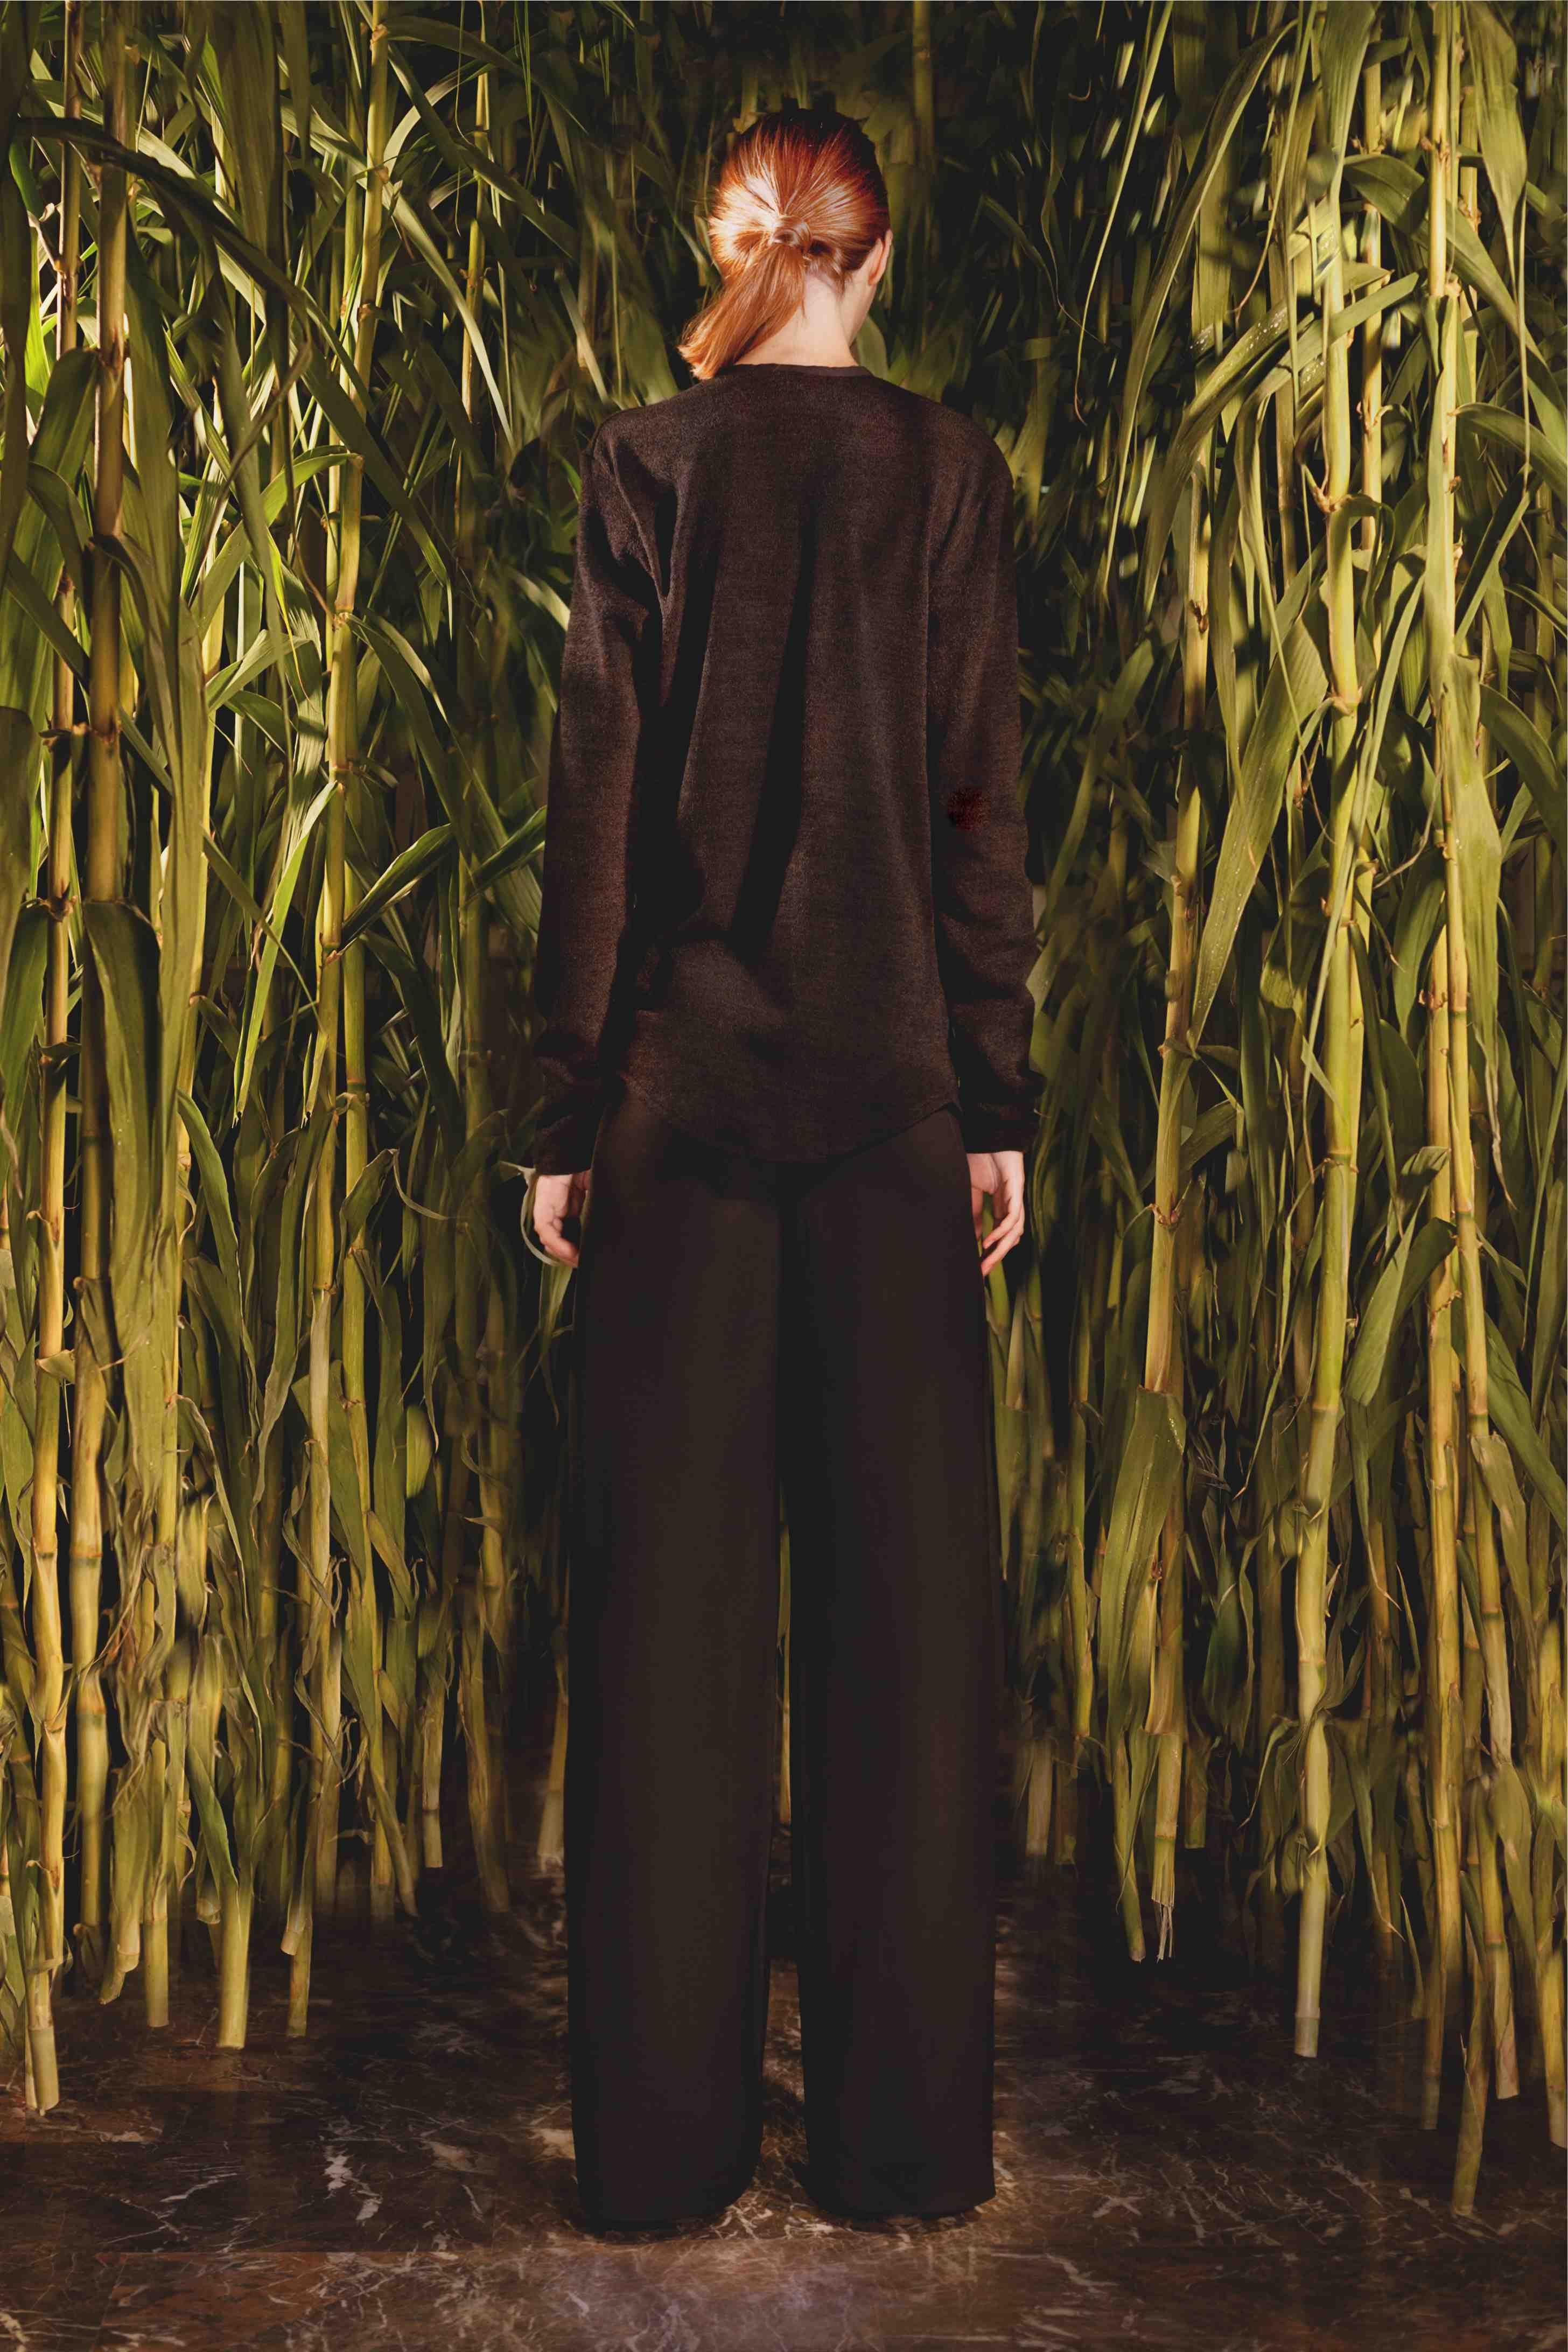 MOD. LUISA (blouse)  MOD. LAURA (pants)  Photographer: Nelum Francesca Caramini & Leonardo Damo  Art Director: Gabriele Litta  Model: Anastasia de Carli  Make up and Hair: Caterina Arnaldi